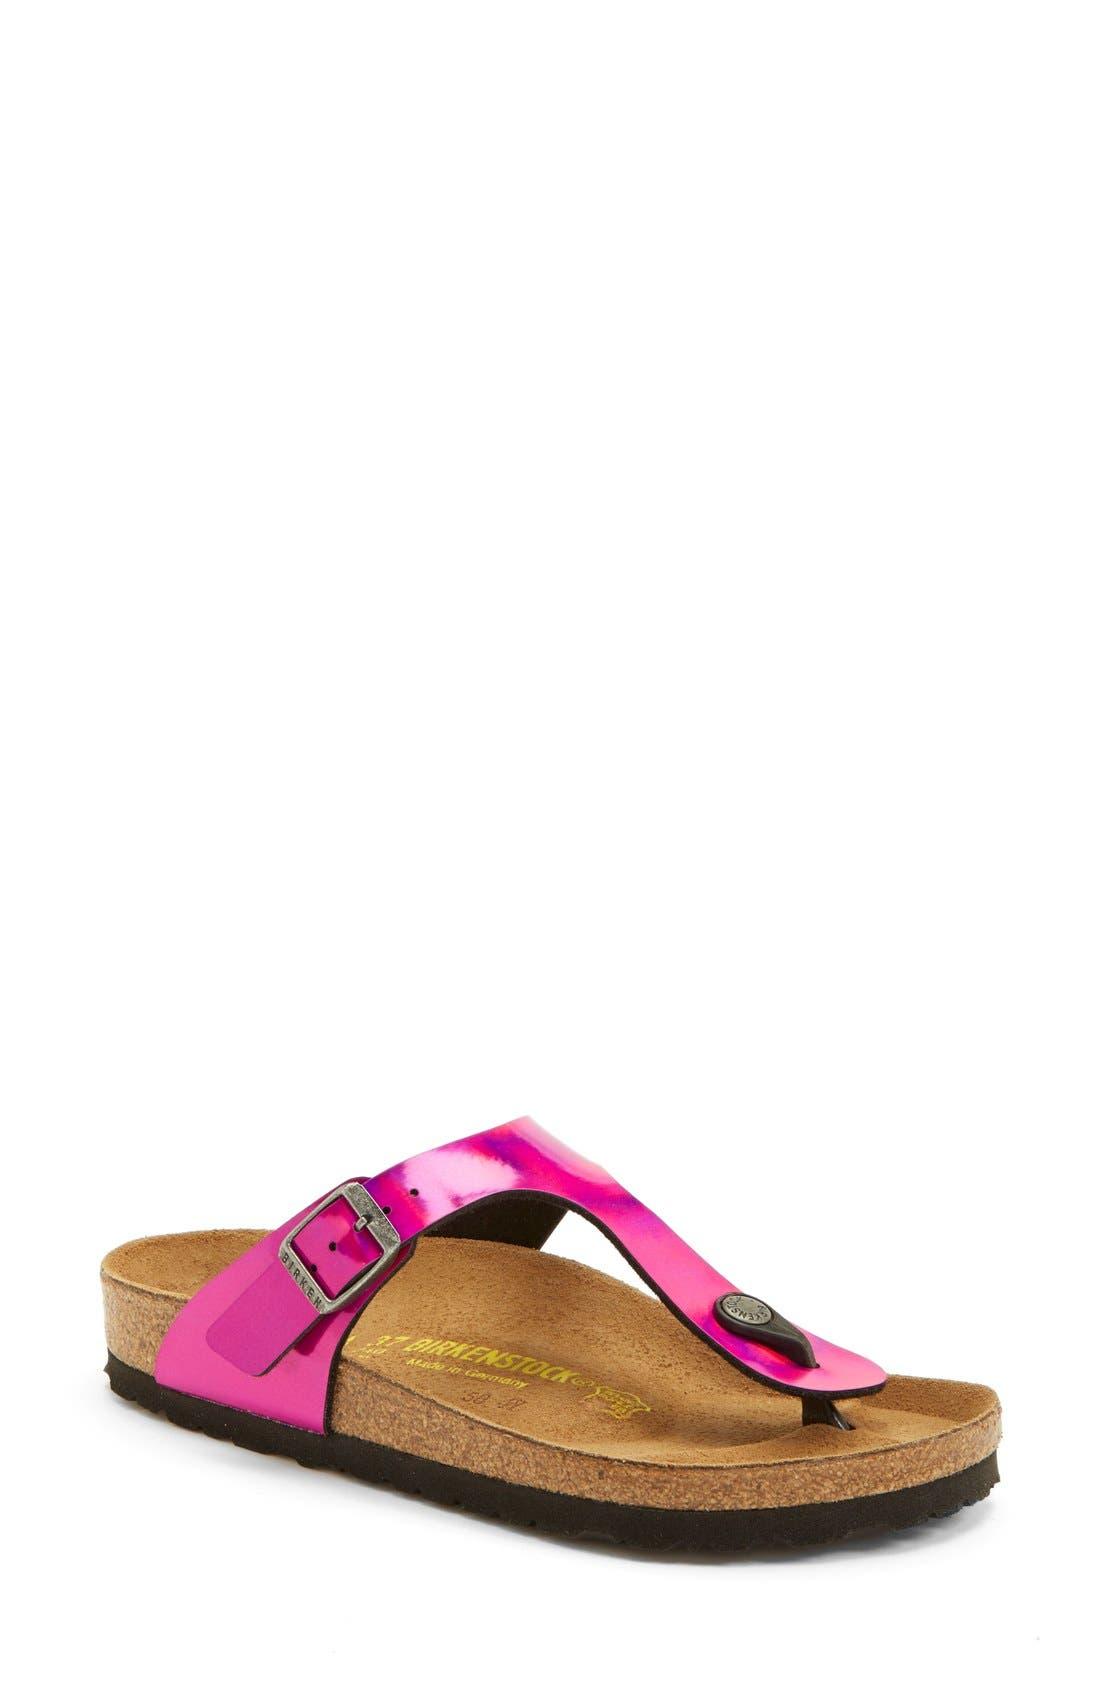 'Gizeh' Thong Sandal,                             Main thumbnail 1, color,                             Pink